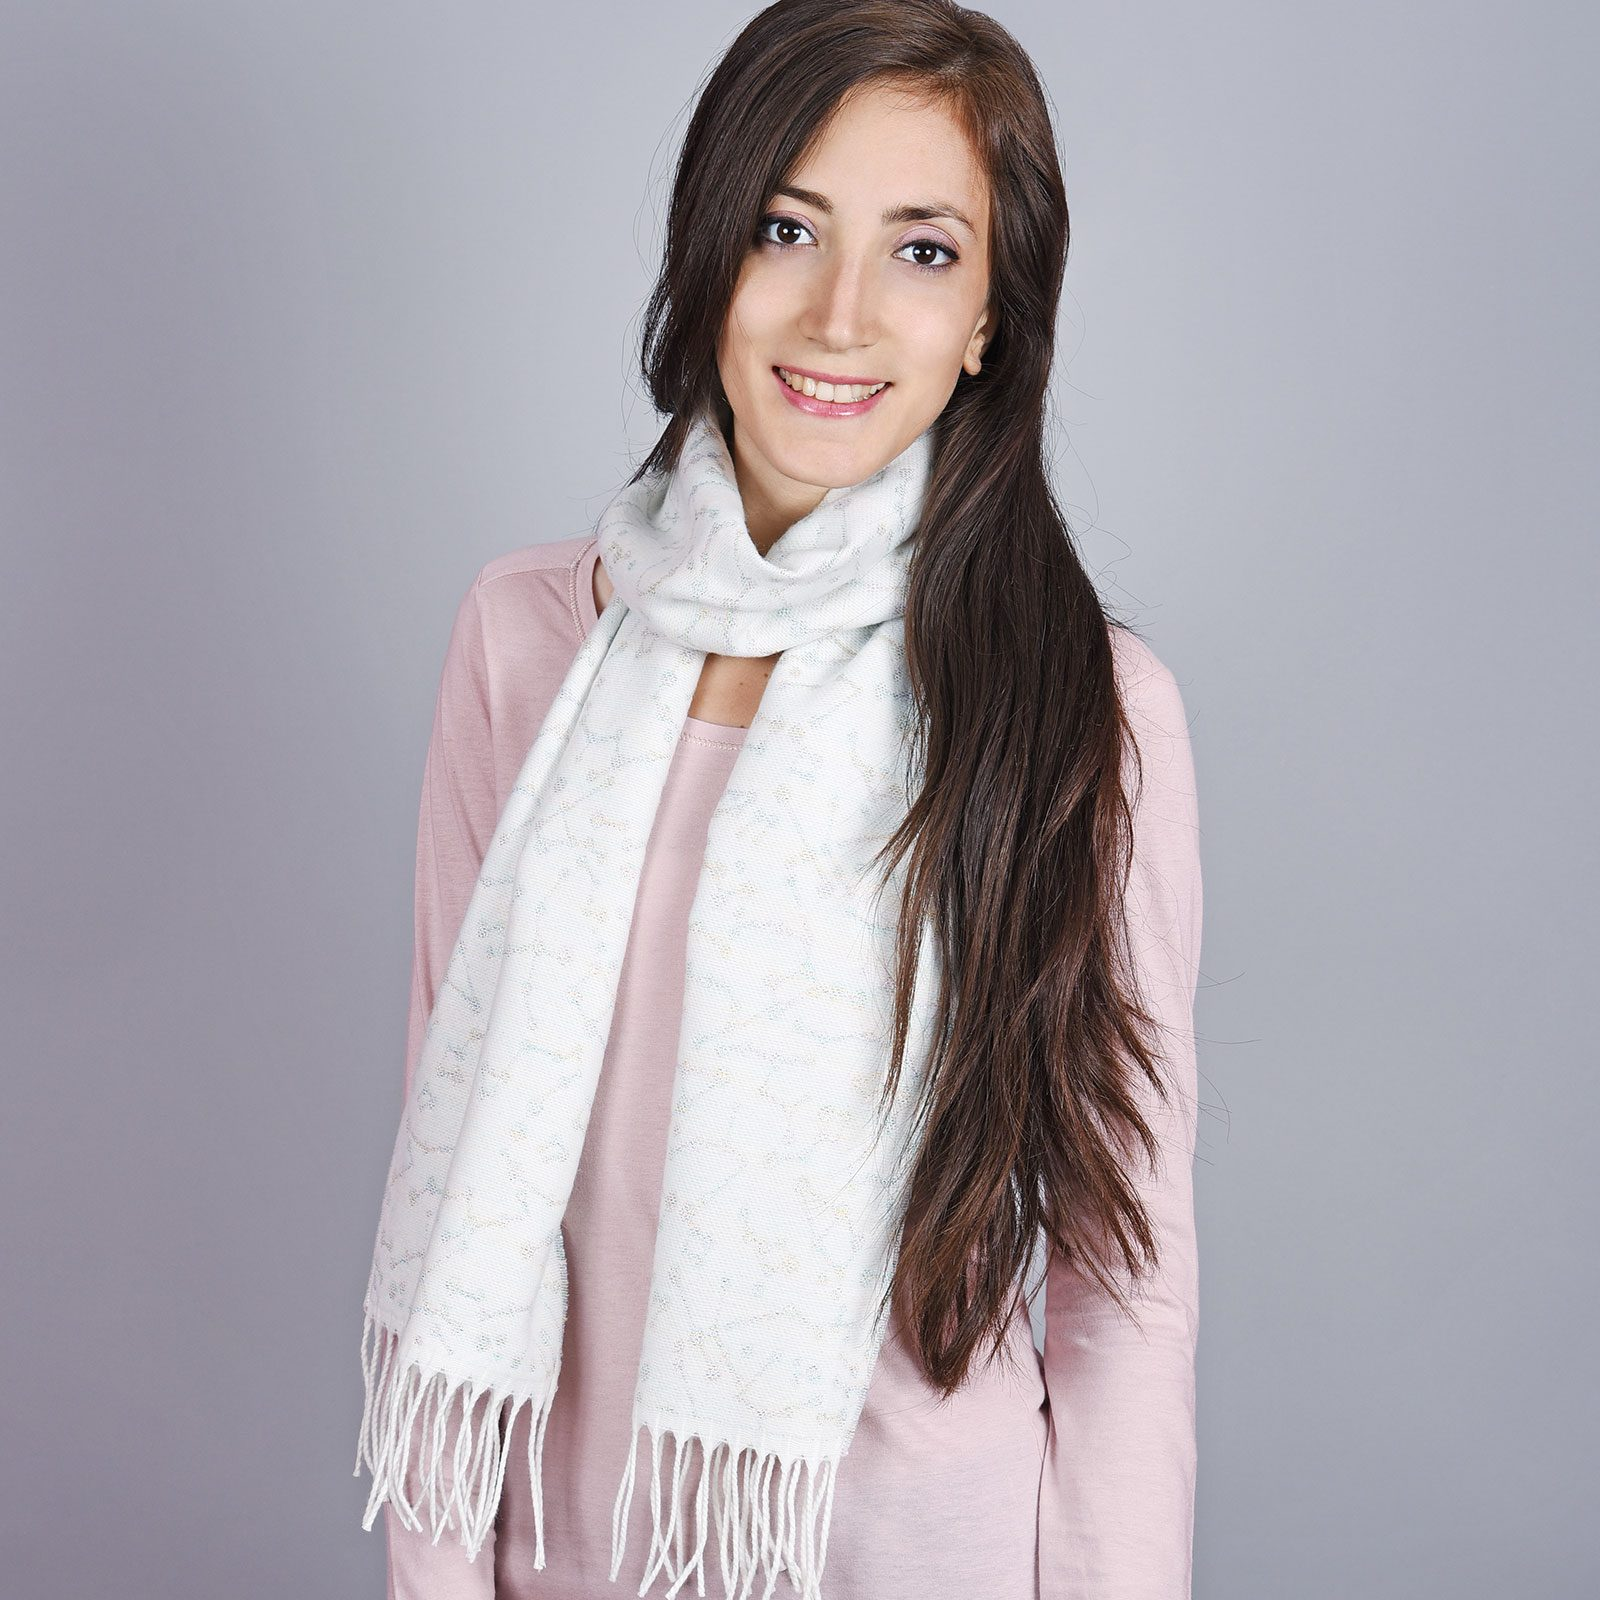 http://lookbook.allee-du-foulard.fr/wp-content/uploads/2019/01/AT-04535-VF16-1-echarpe-femme-blanche-gris-1600x1600.jpg